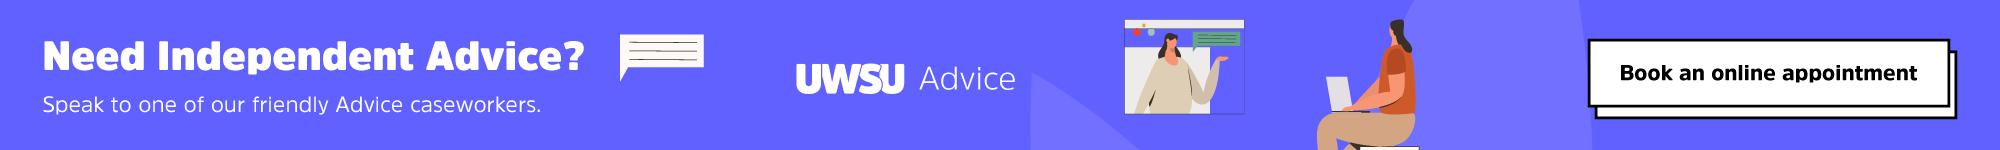 Advice ad